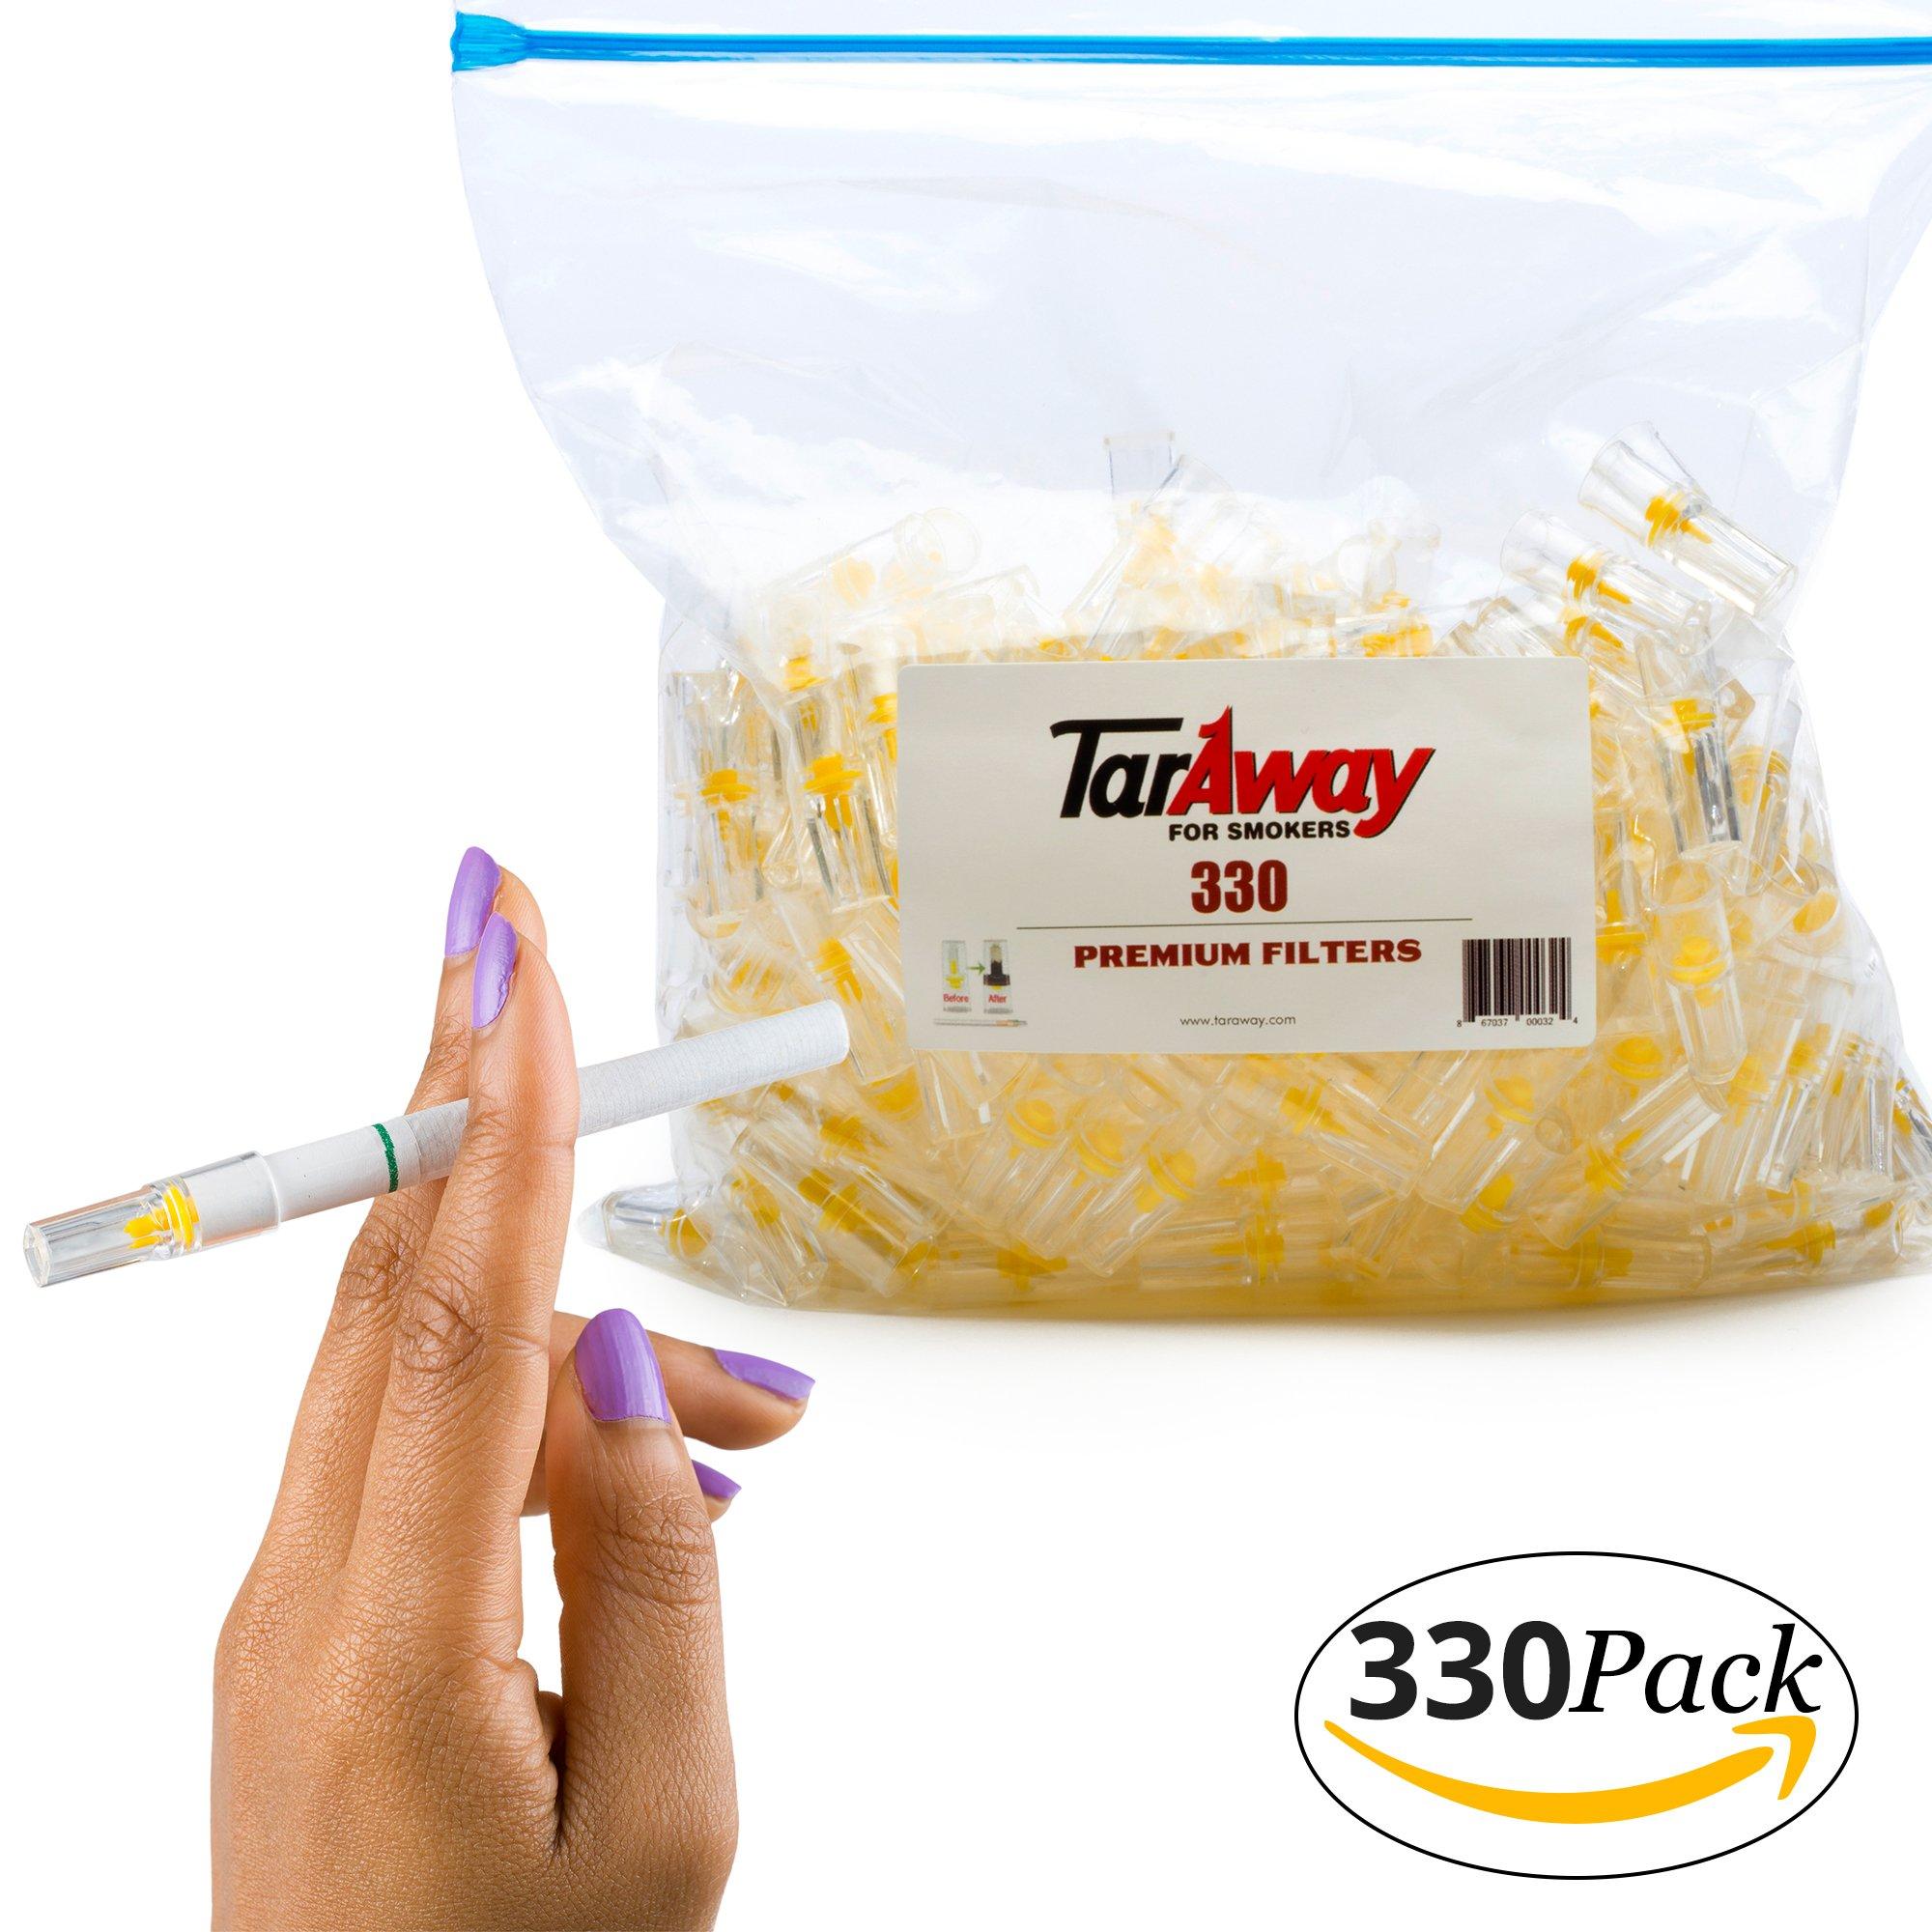 Taraway Cigarette Filters | Food Grade Disposable Plastic Filter Tips - Pack of 330 Filter Cartridges